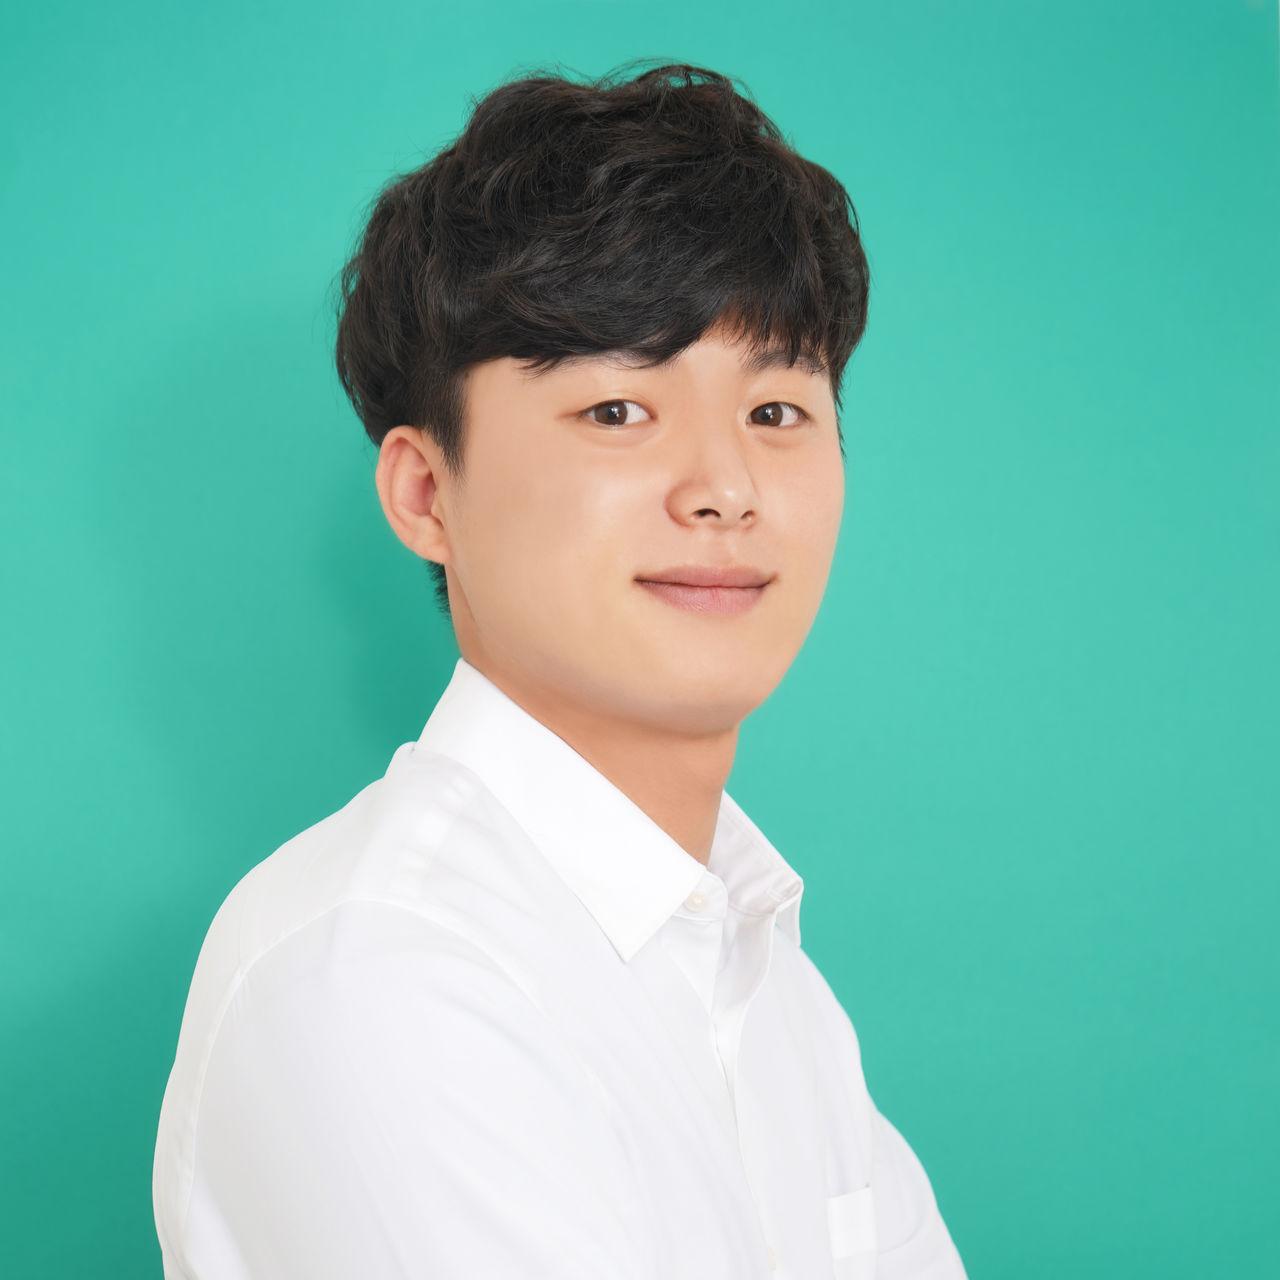 <b>Woo Il Woo</b><br>Lead Fundraiser<br>